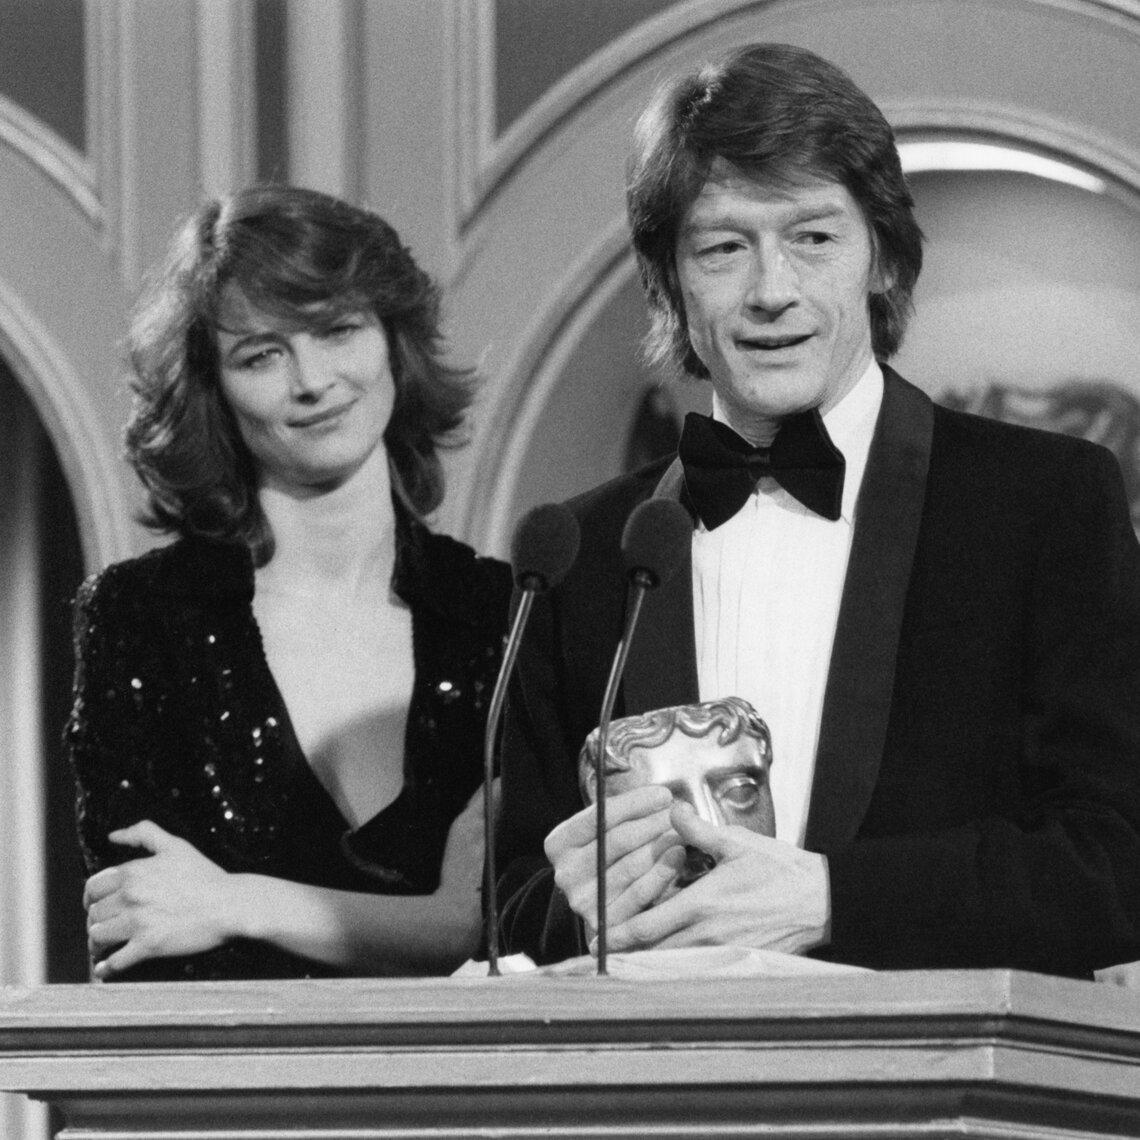 varoa puhdistushinnat koko kokoelma John Hurt - Outstanding British Contribution to Cinema | BAFTA